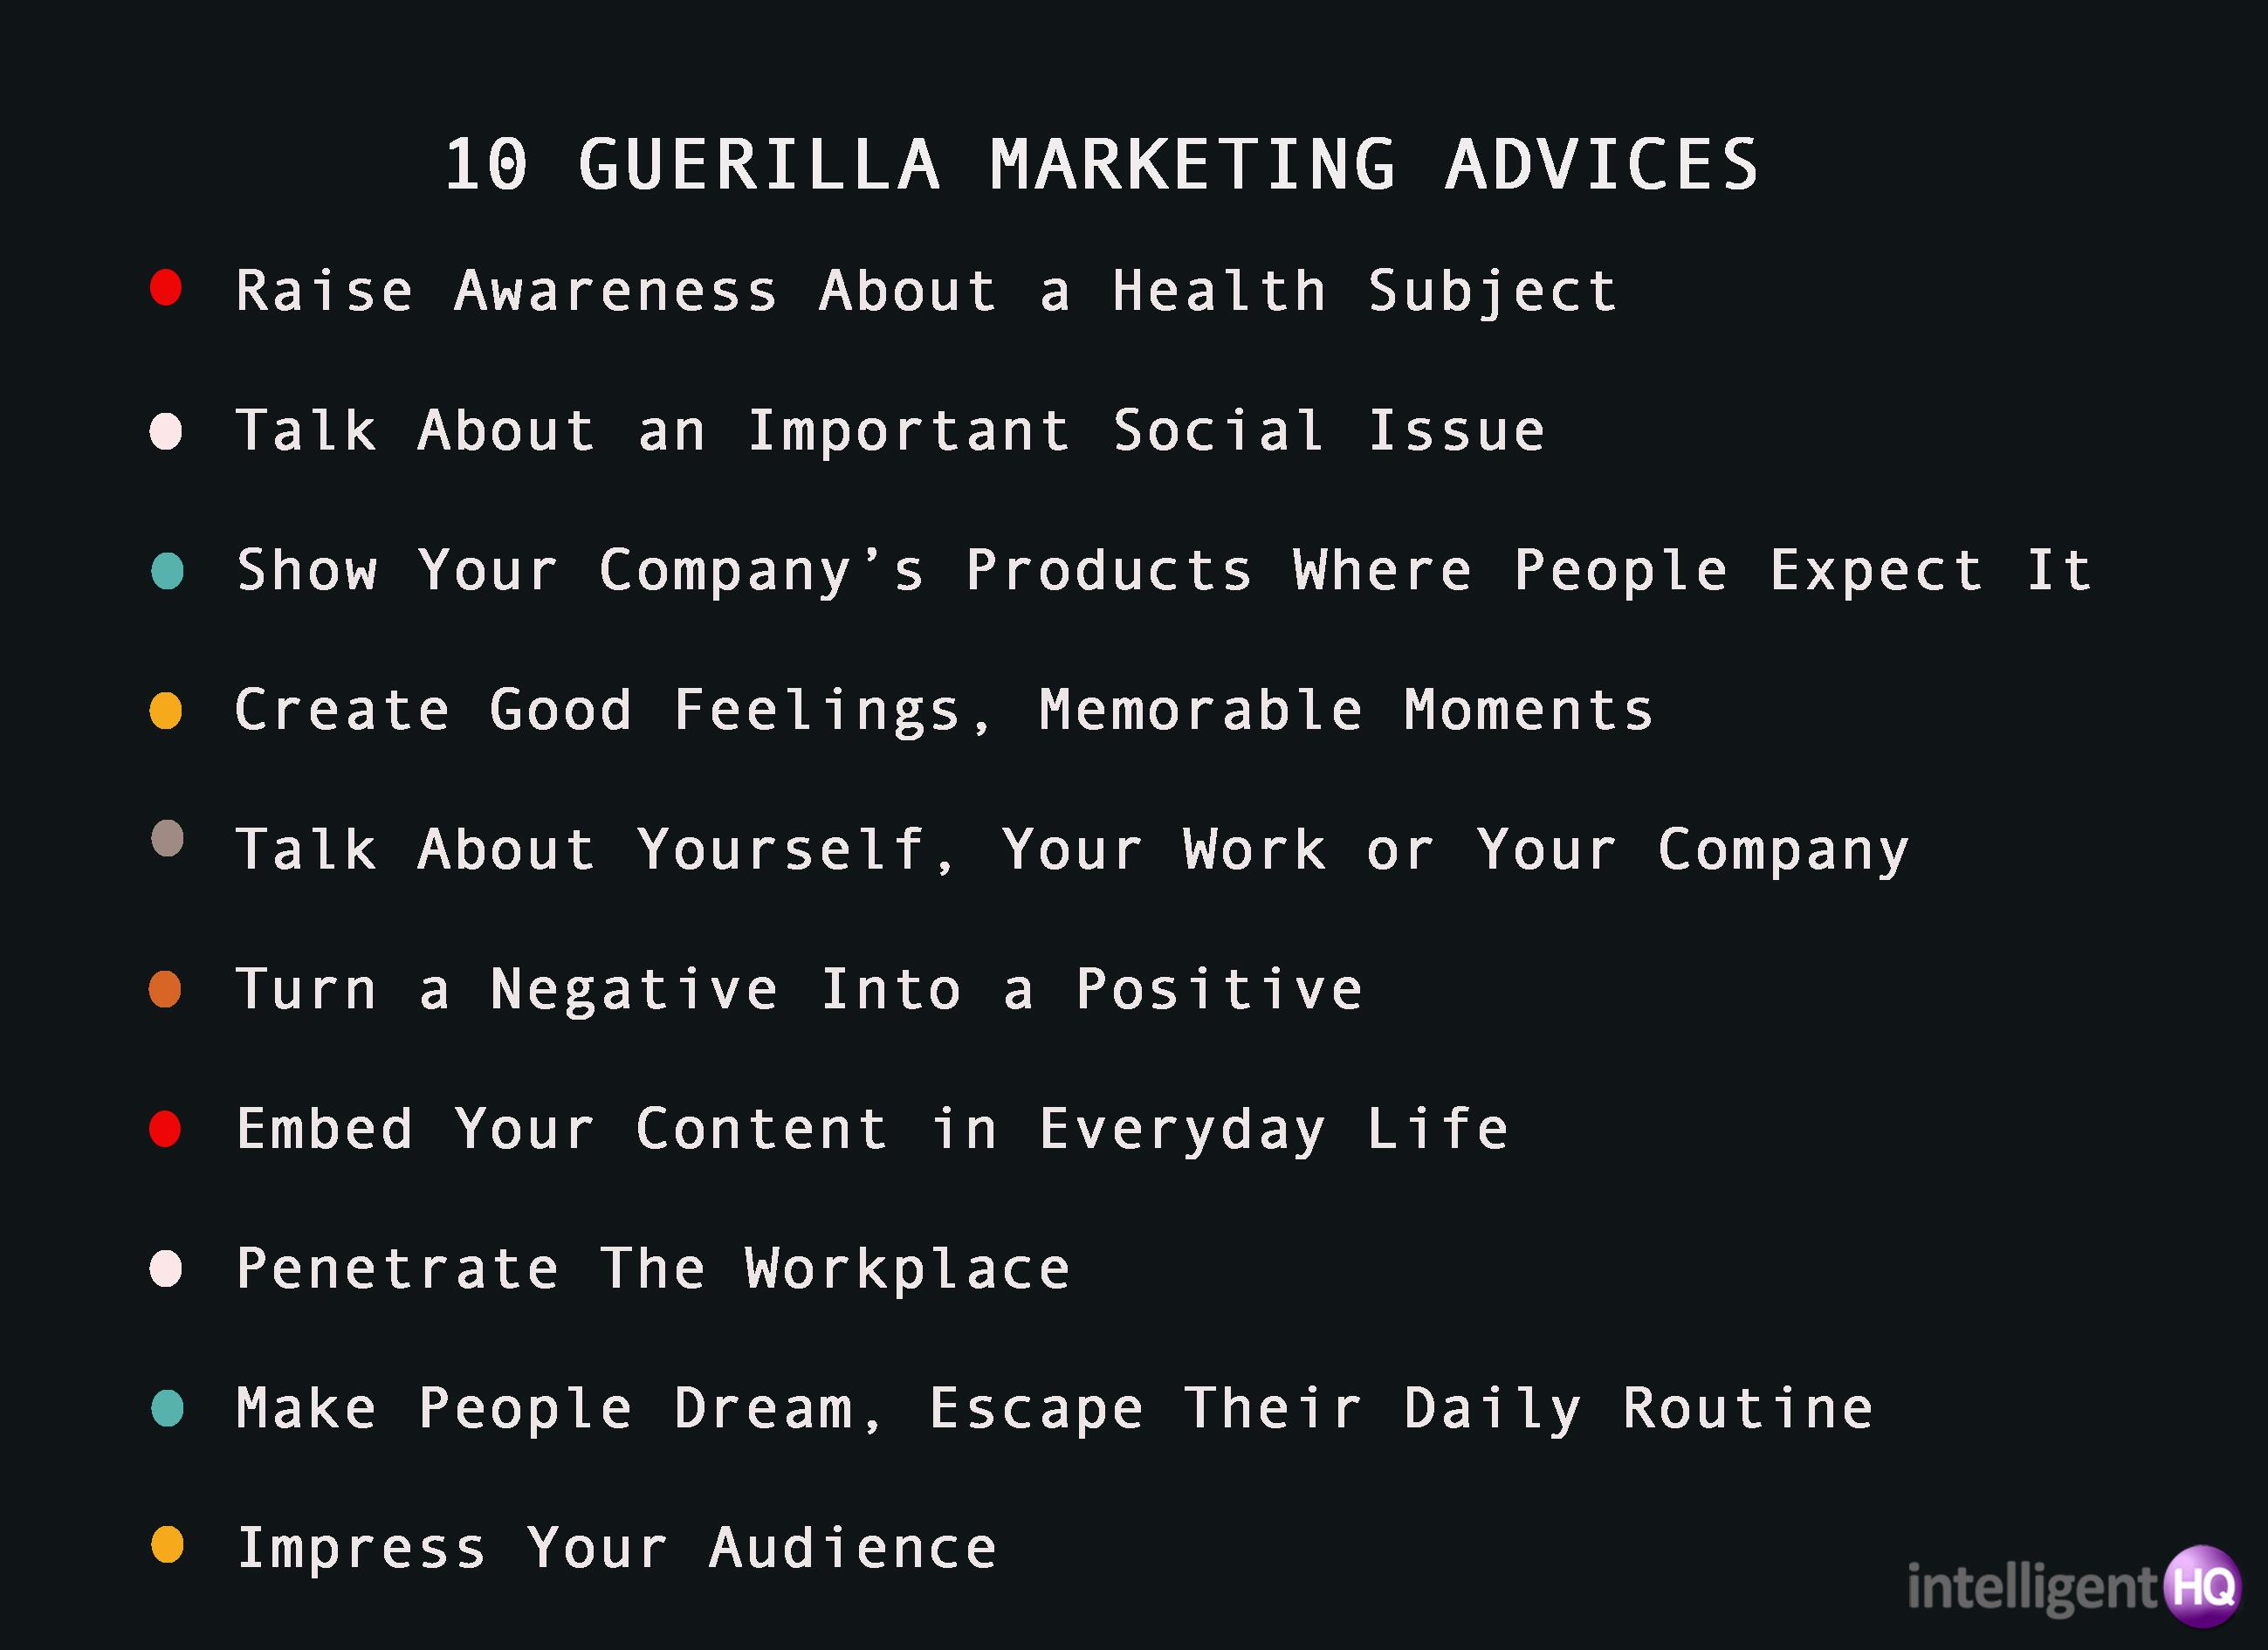 10 guerrilla marketing advices Intelligenthq